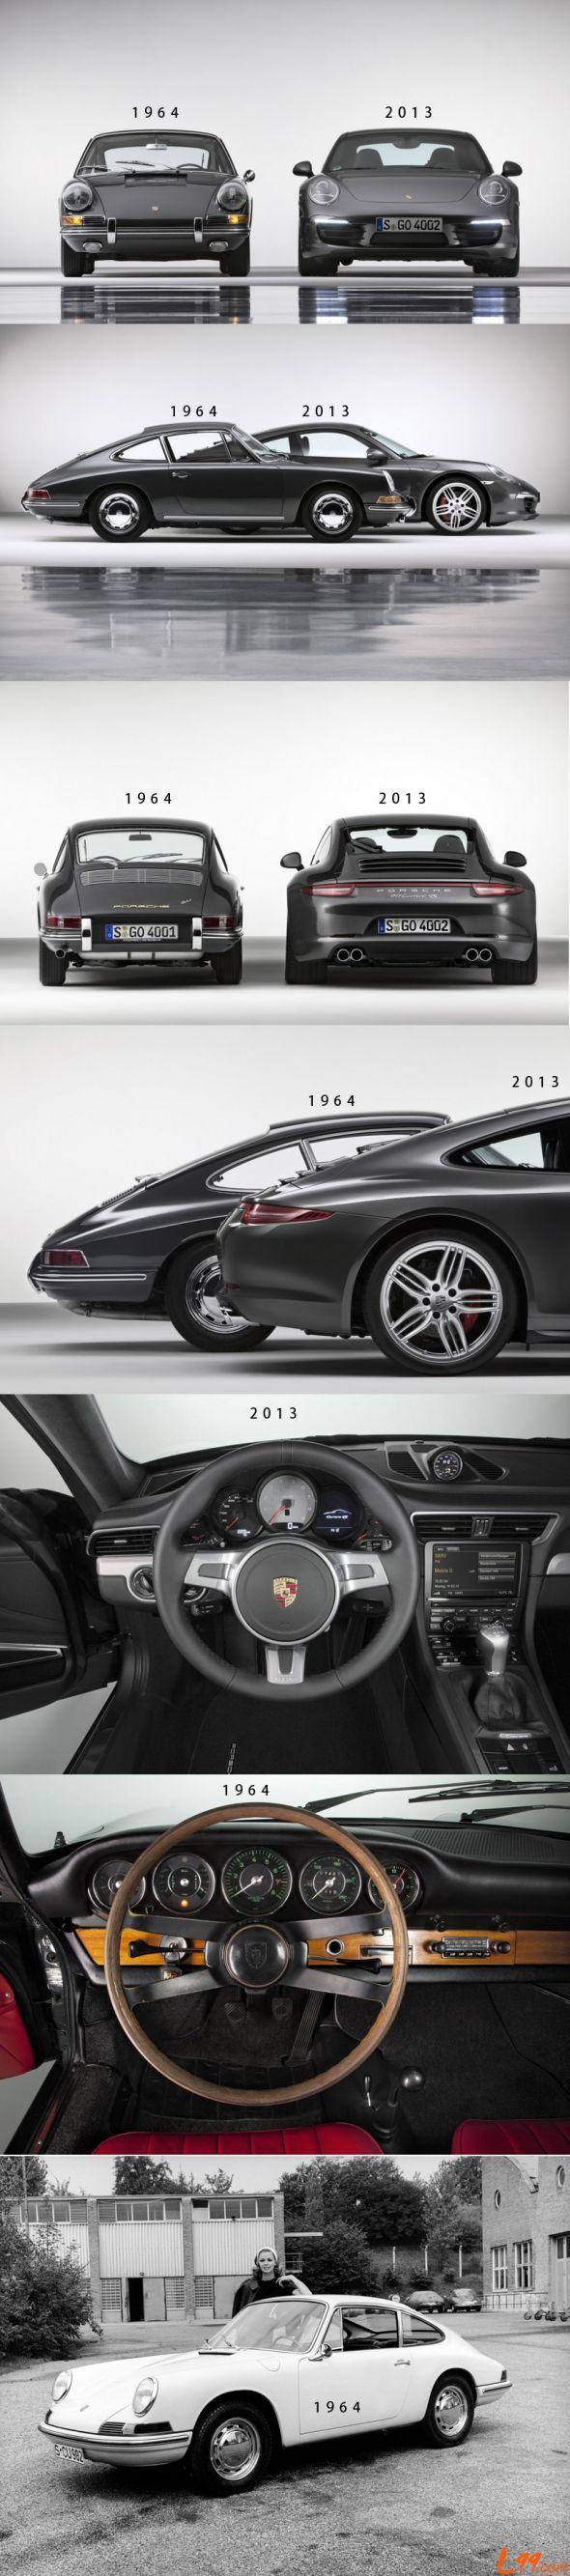 Porsche 911 ~ 1964 vs 2013 || http://wojtektylus.com/otwarcie-sezonu-2012-porsche-club-poland-w-lublinie/ || #porsche #911 #porsche911